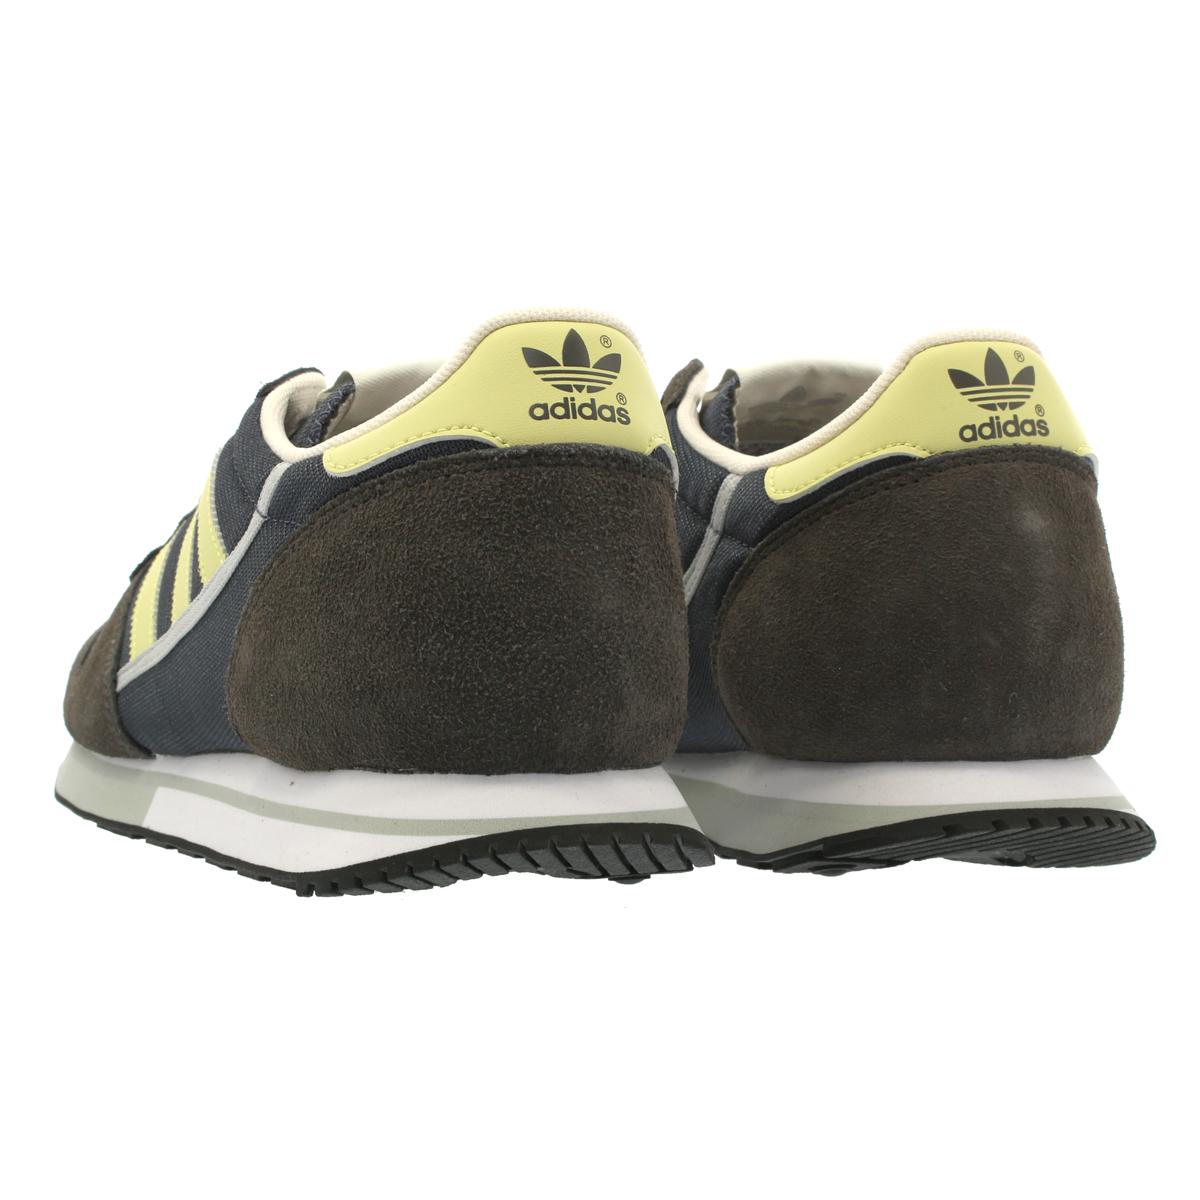 sports shoes b1320 48d90 adidas ZX 280 SPZL Adidas ZX 280 SPZL GREY/BLUE